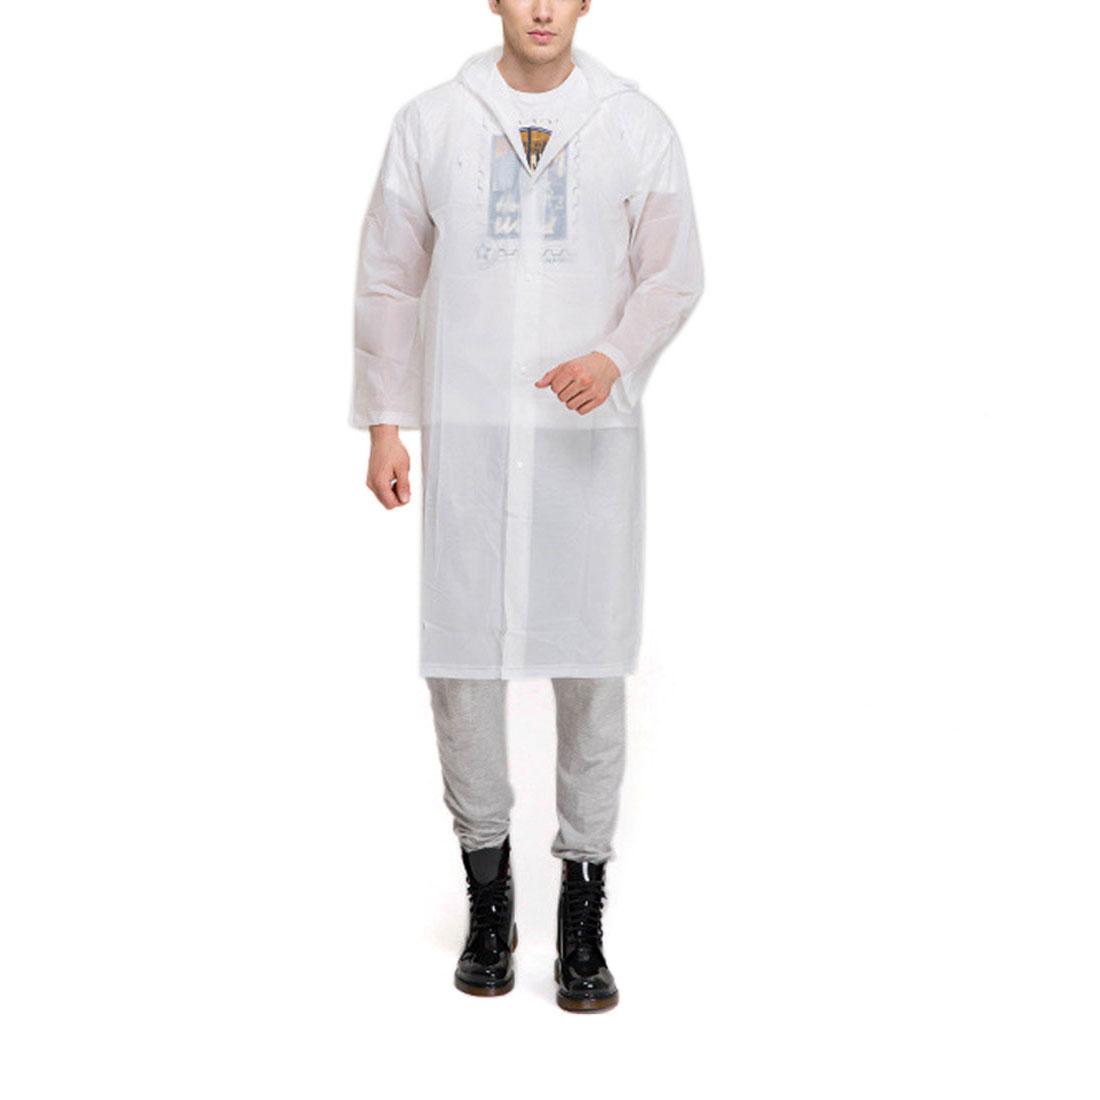 XL White Portable EVA Waterproof Adult Raincoat Hooded Rain Poncho for Bicycle